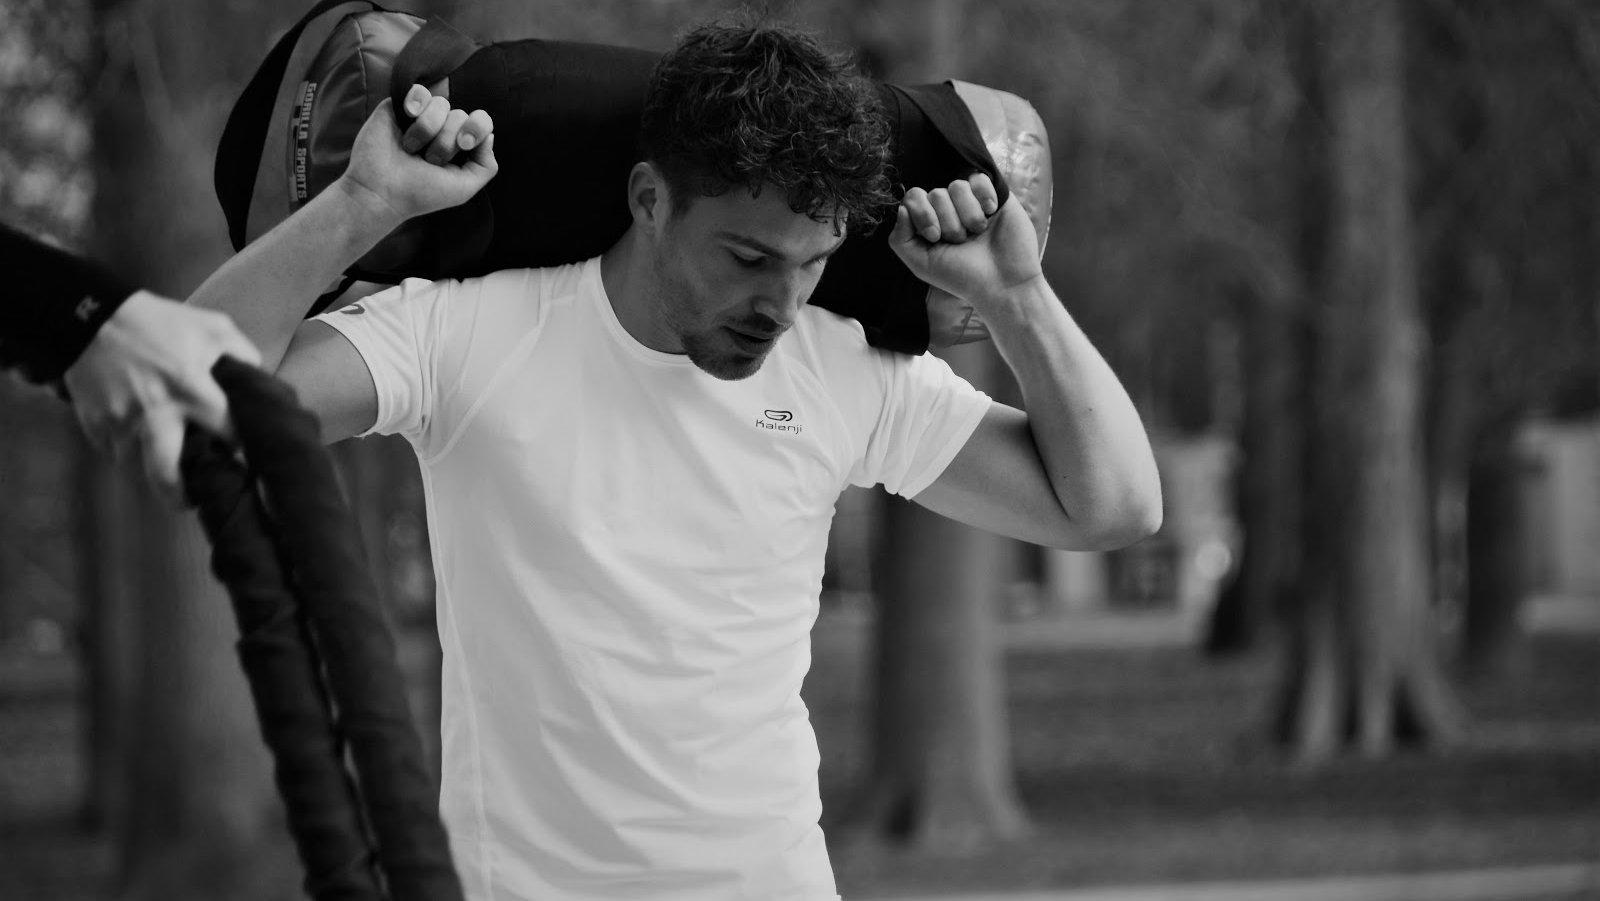 Motivation vs. Dedication | Where Should Your Focus Be?